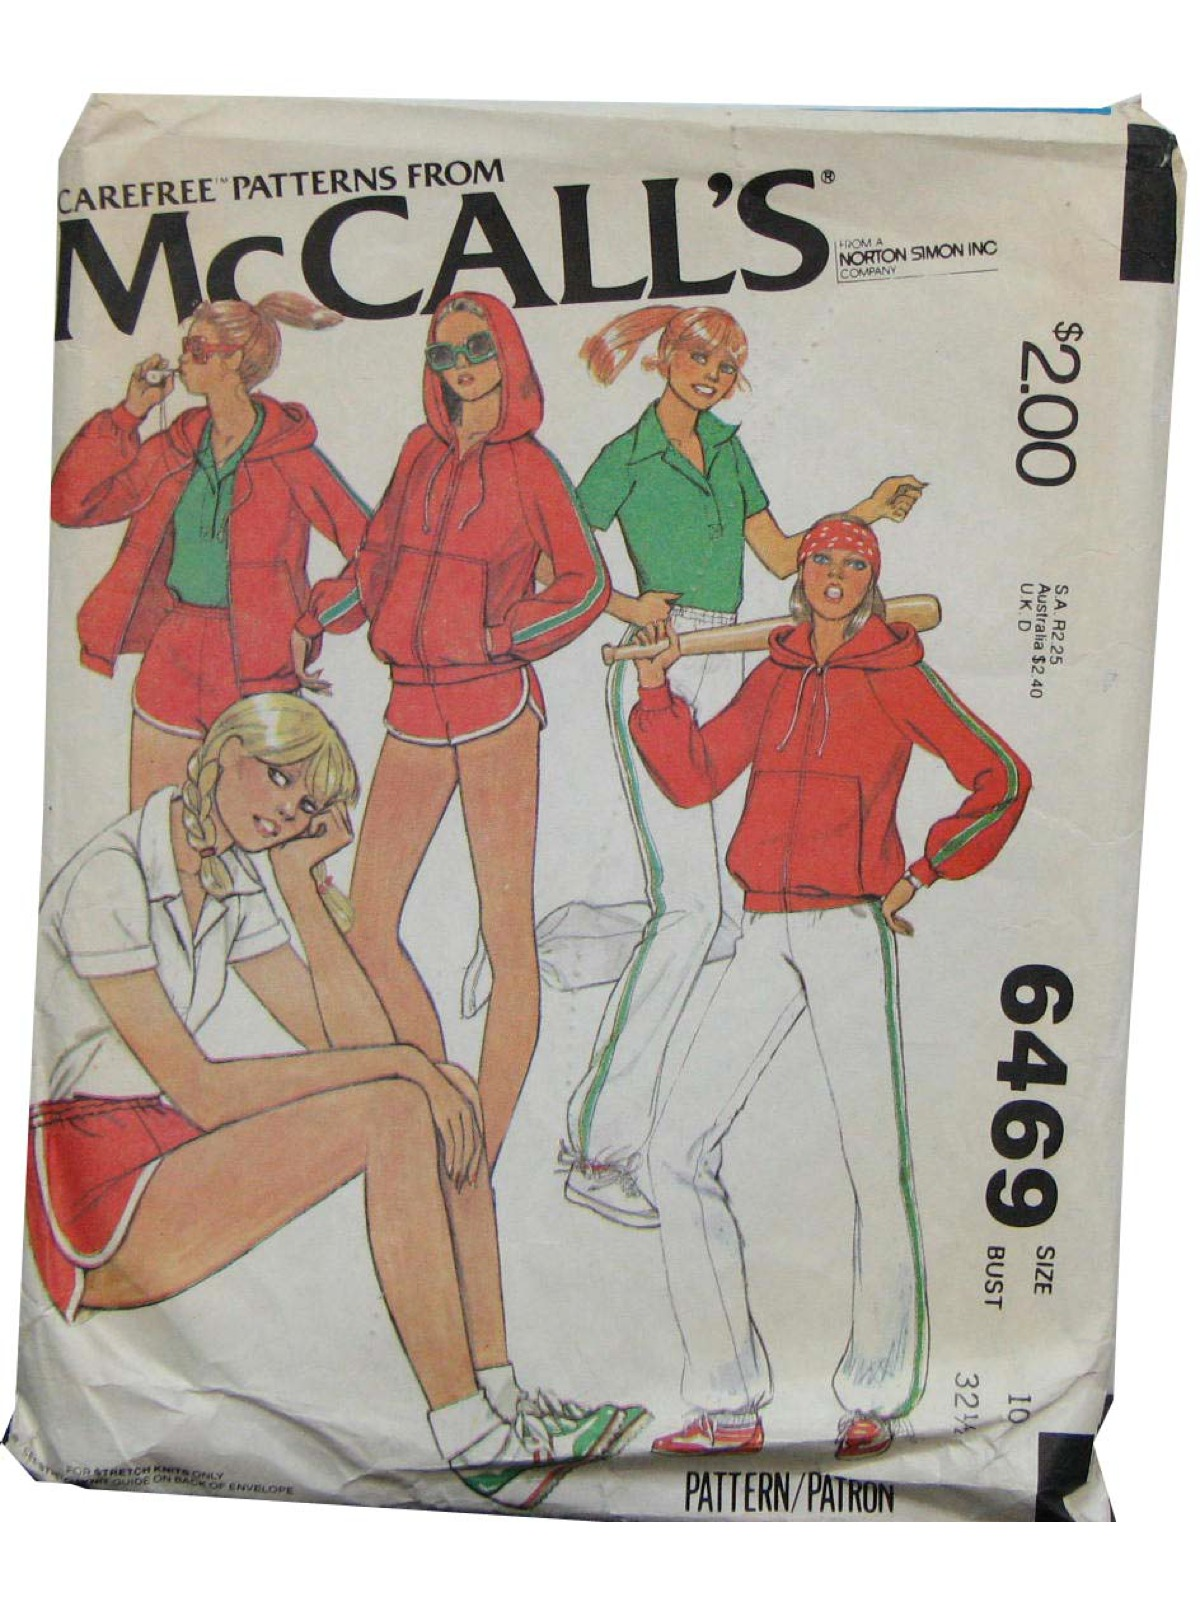 Mccalls Pattern No 6469 1970s Vintage Sewing Pattern 70s